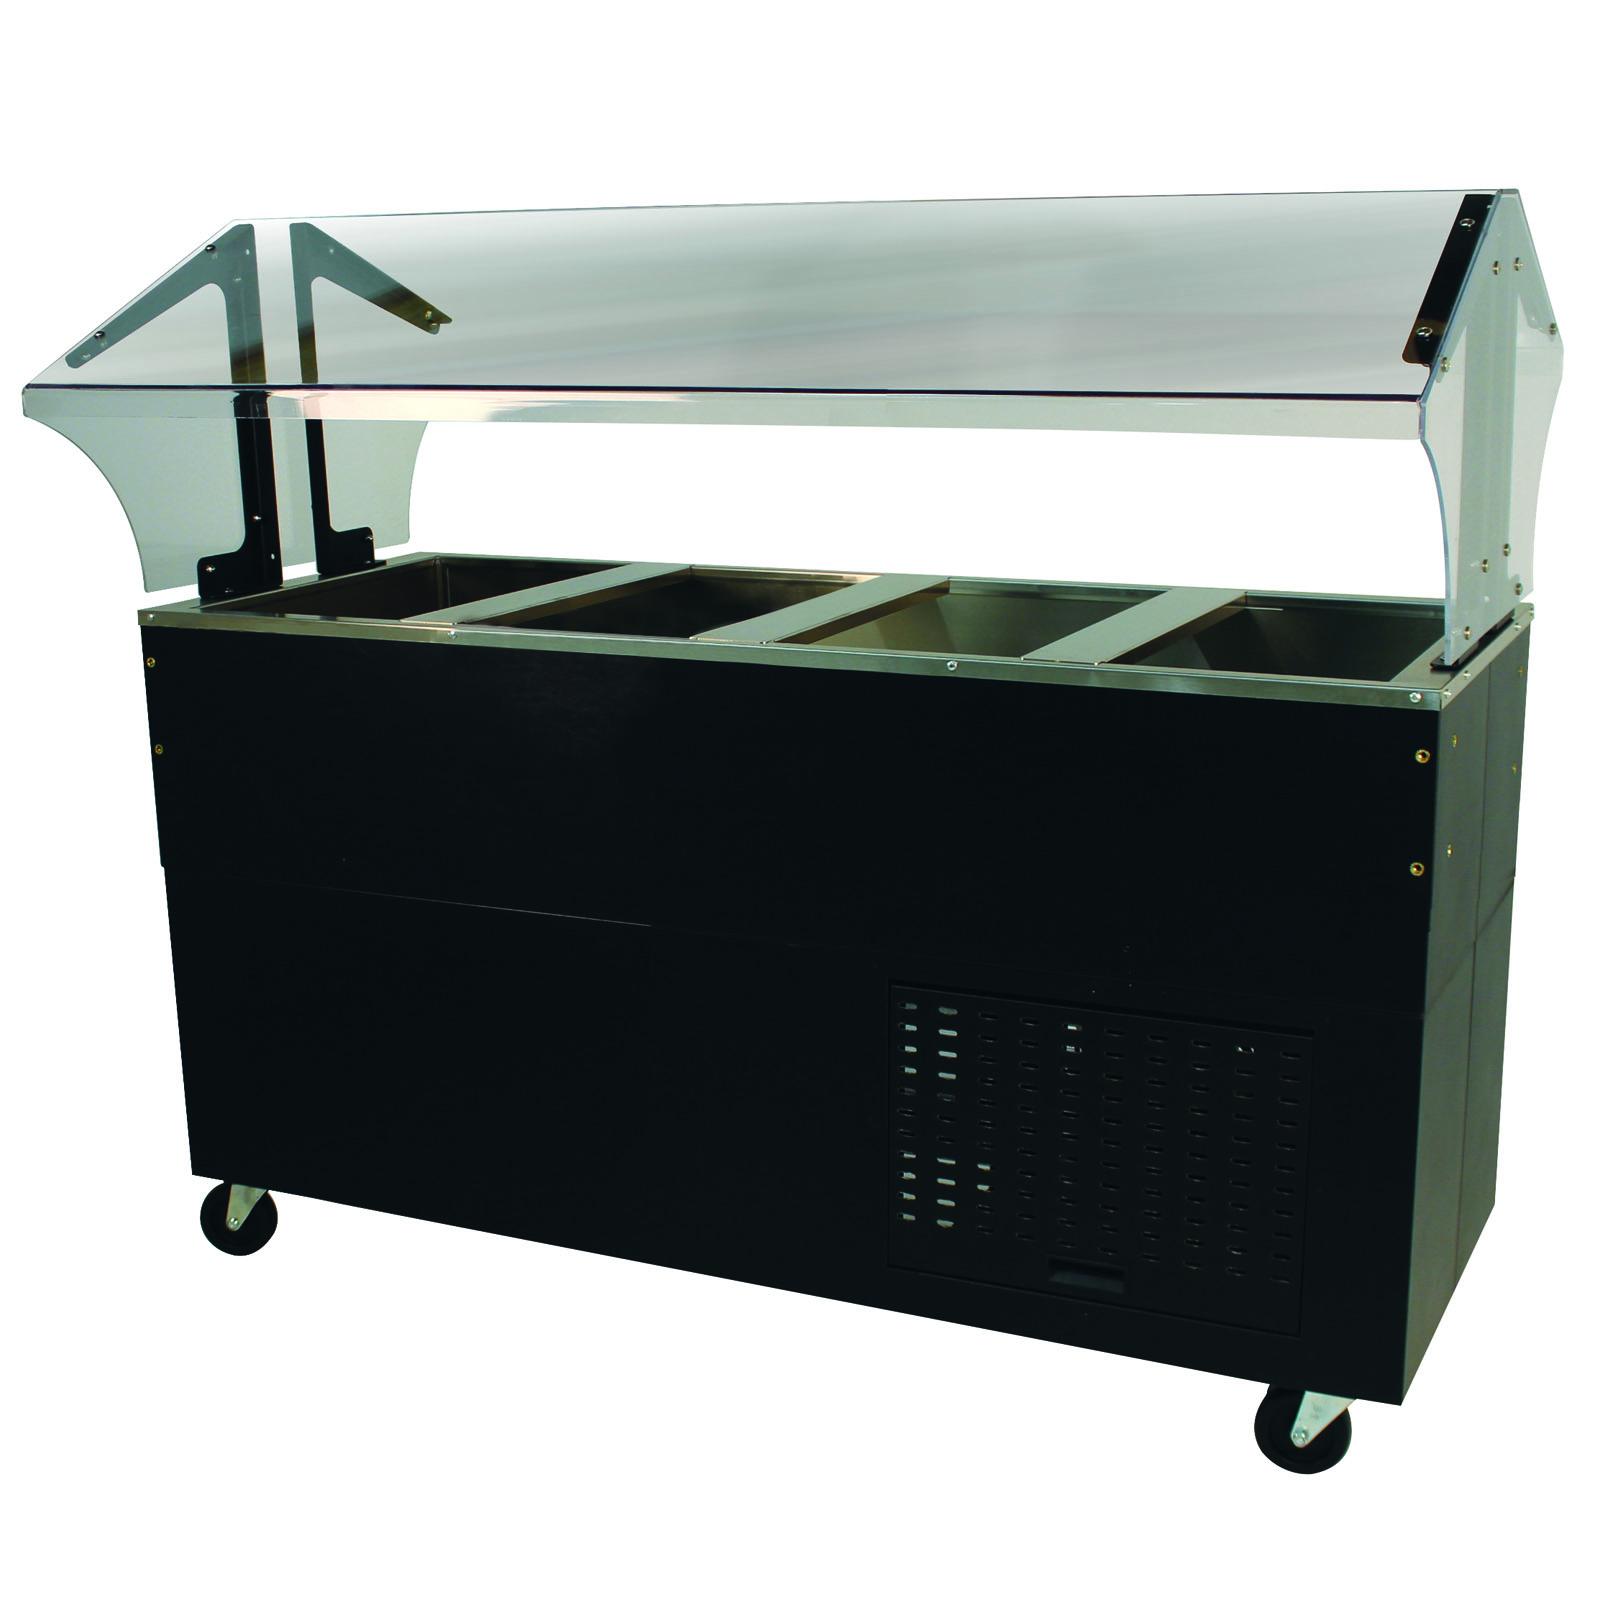 Advance Tabco BMACP4-B-SB serving counter, cold food